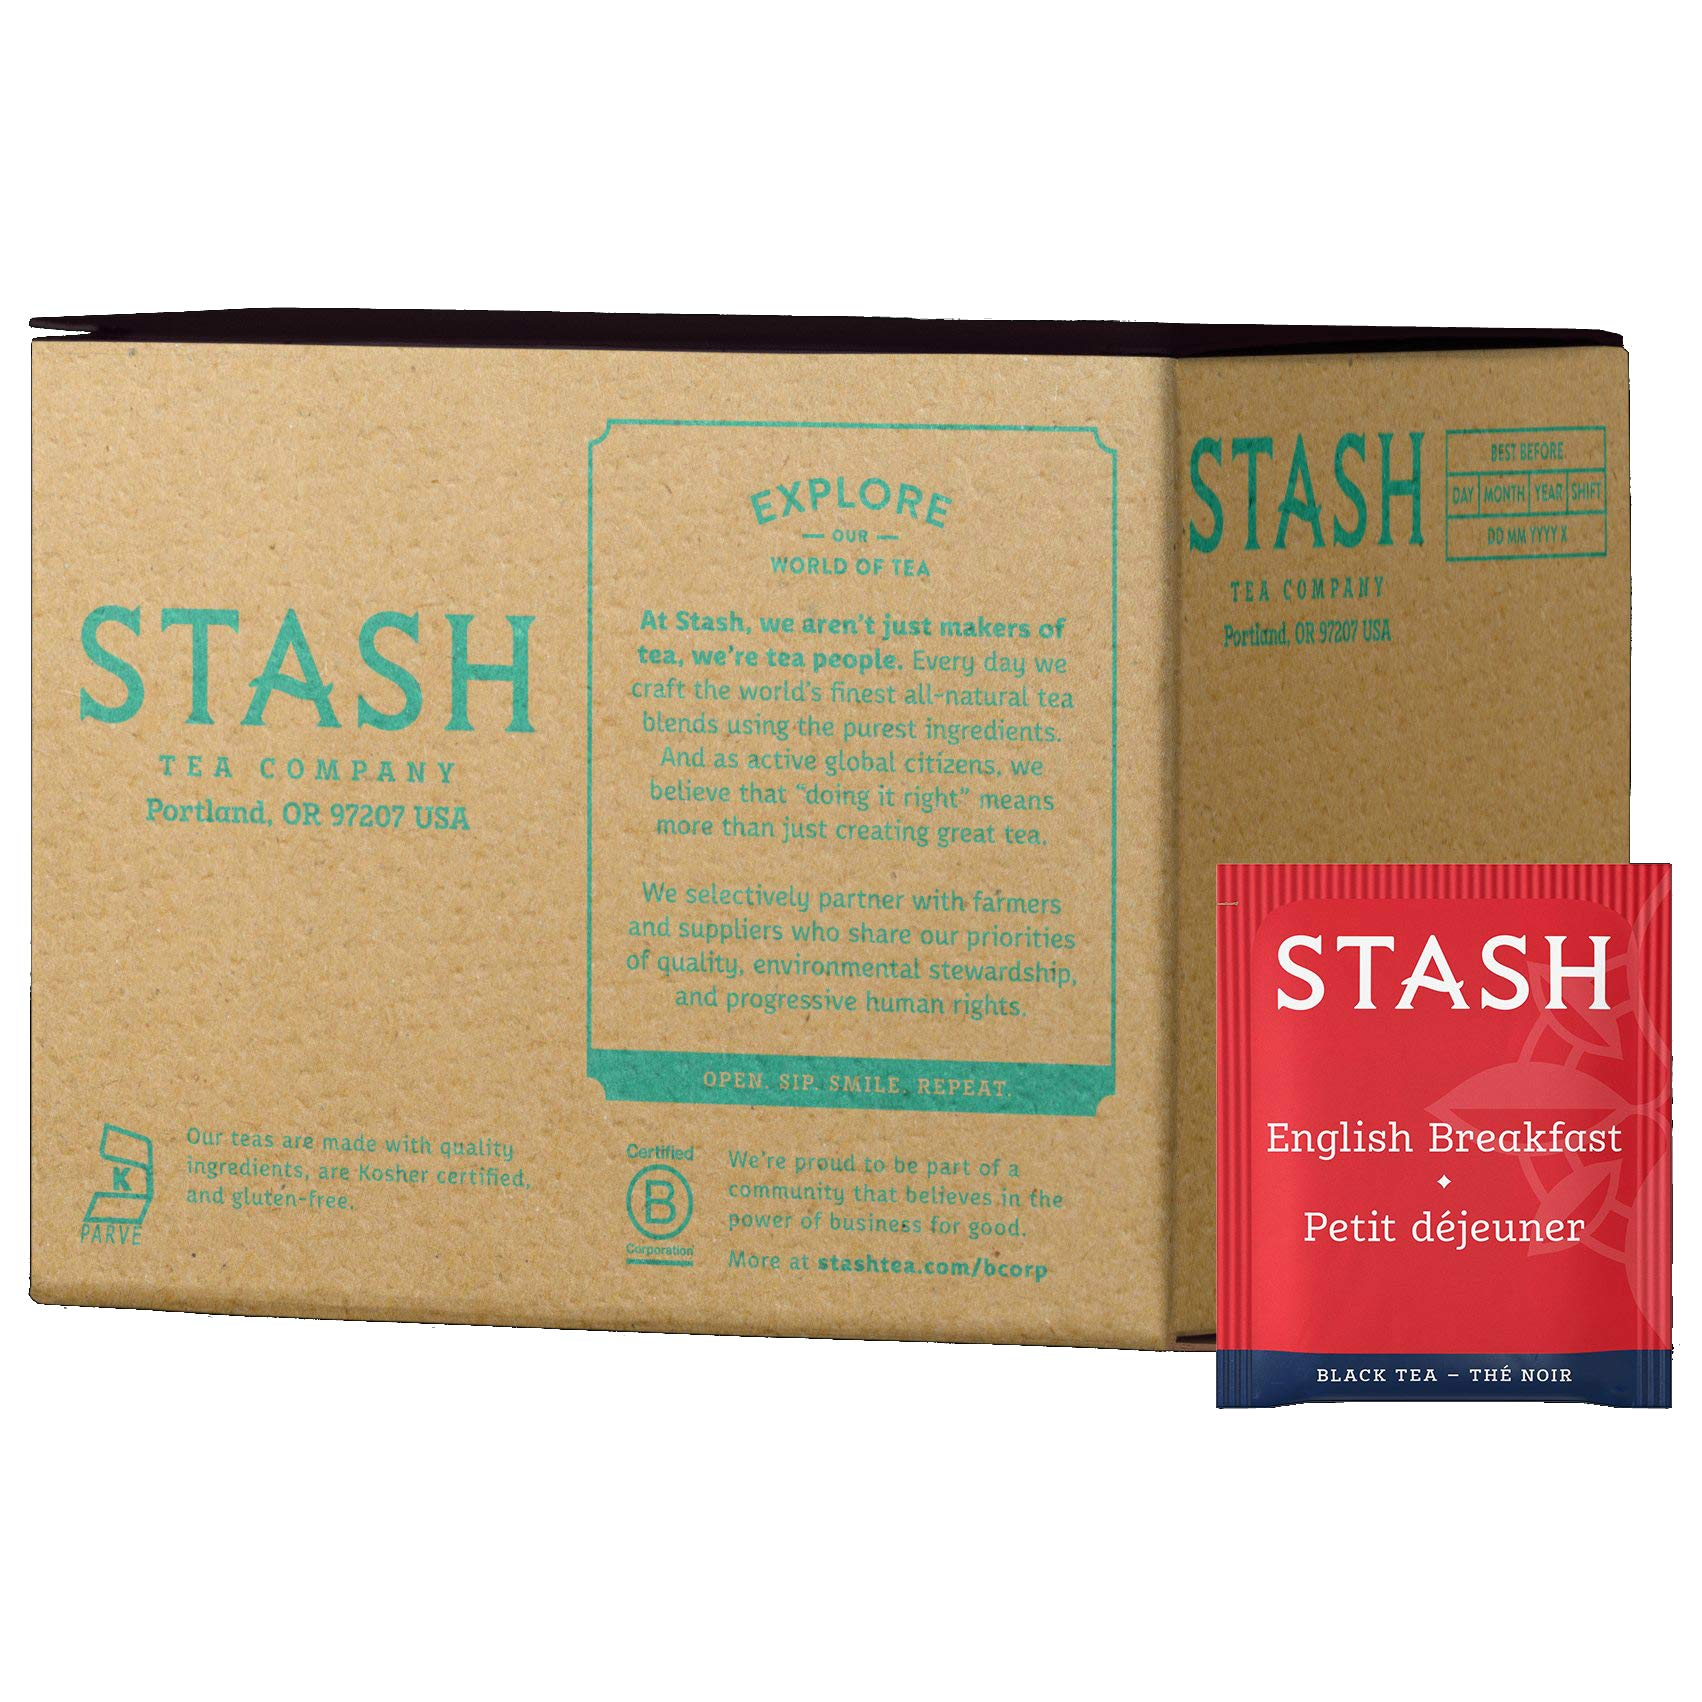 Stash Tea English Breakfast Black Tea 100 Count Box of Tea Bags in Foil by Stash